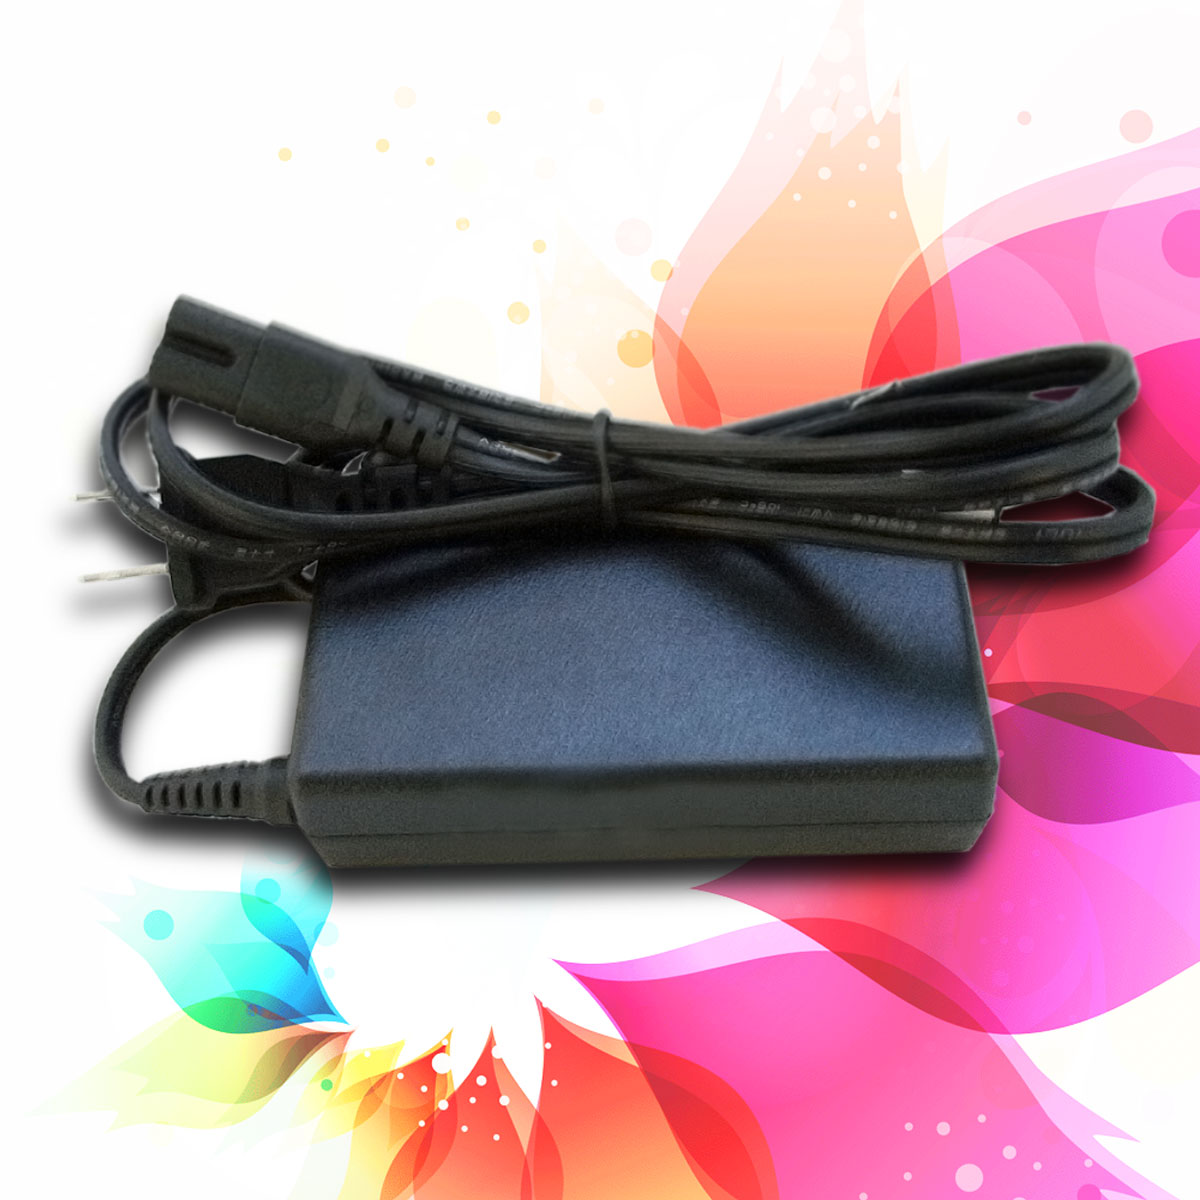 AC Power Adapter for Compaq Presario CQ60-211dx CQ60-215dx CQ50-110us CQ61-100